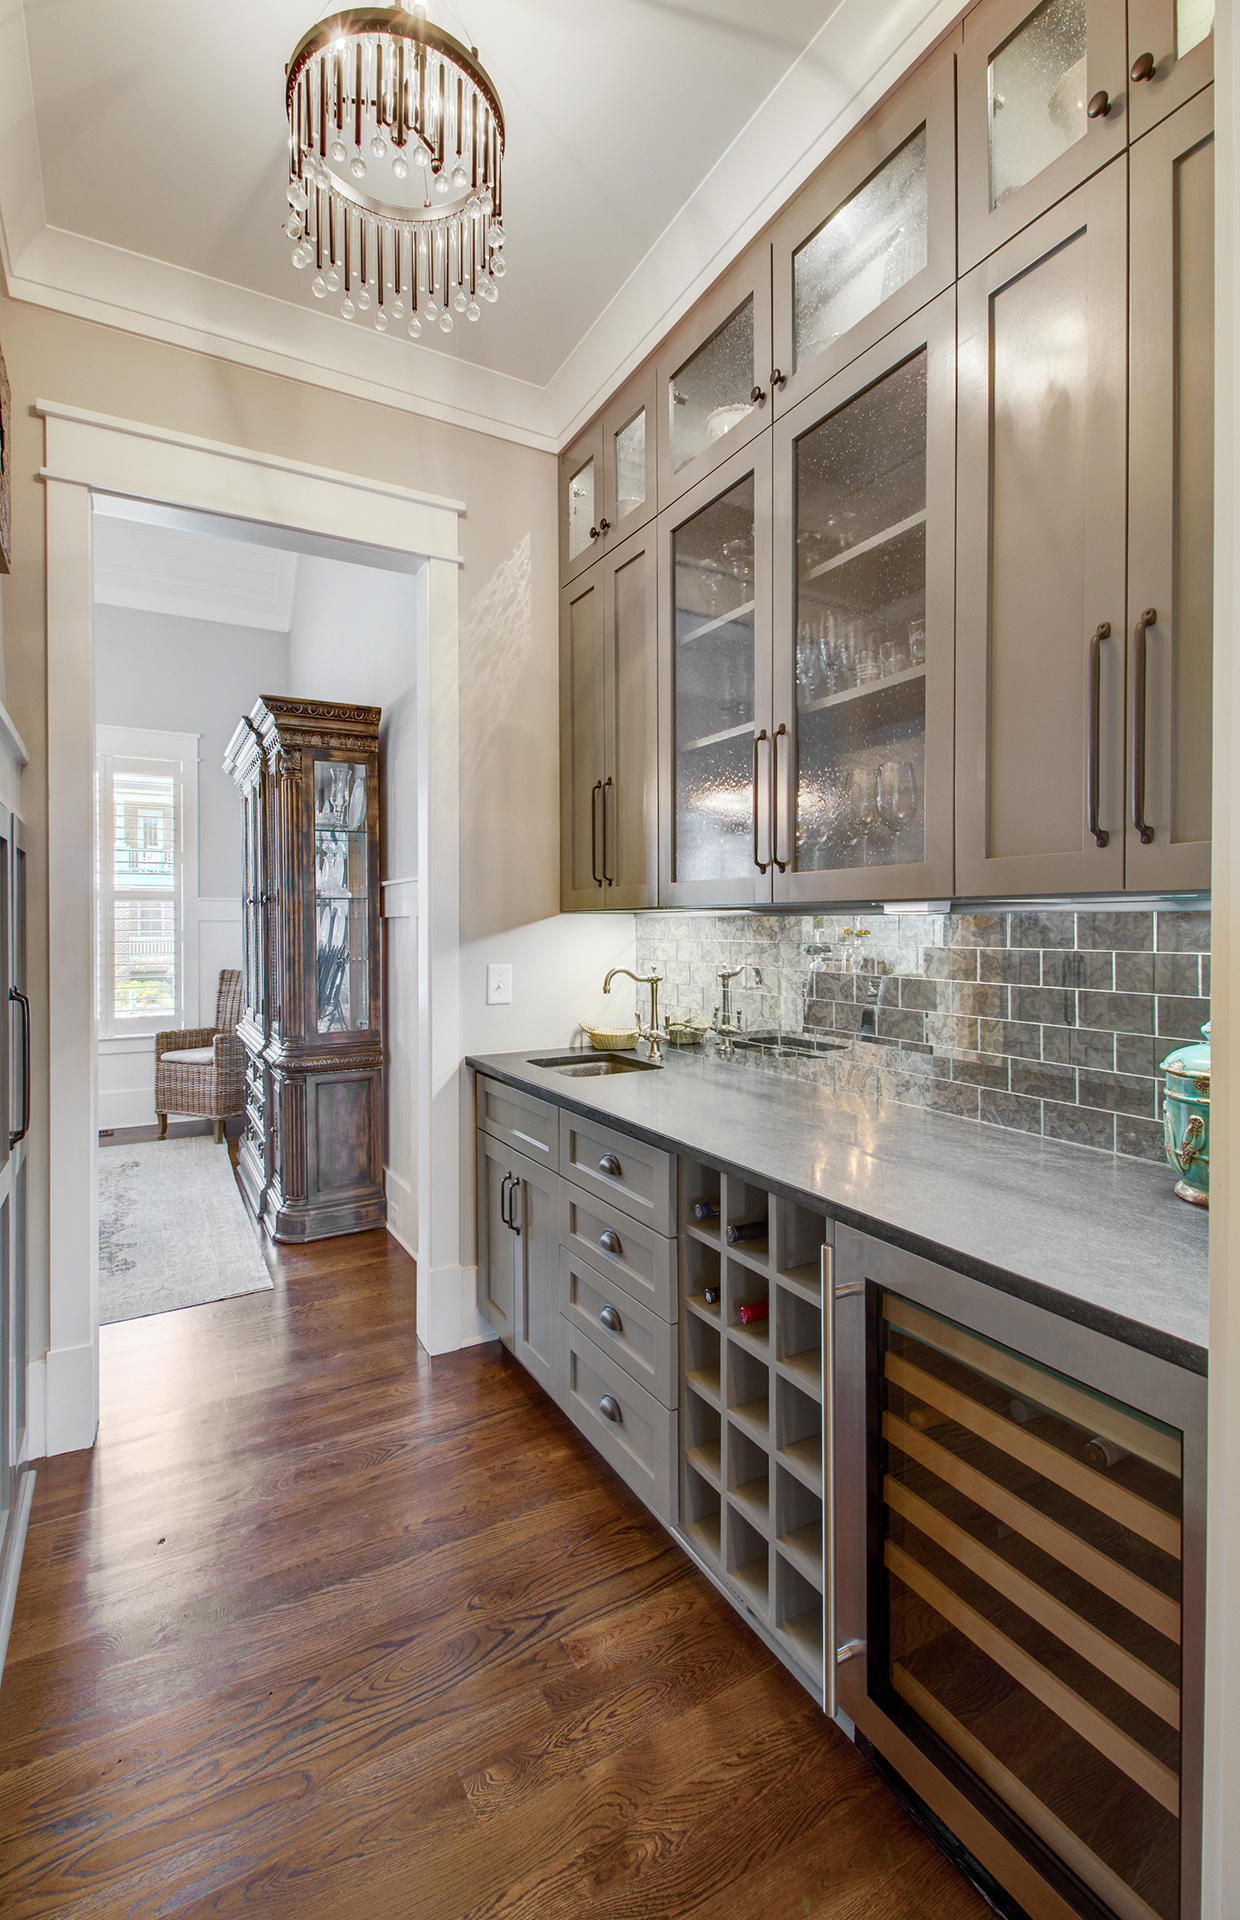 Daniel Island Park Homes For Sale - 117 Brailsford, Charleston, SC - 1